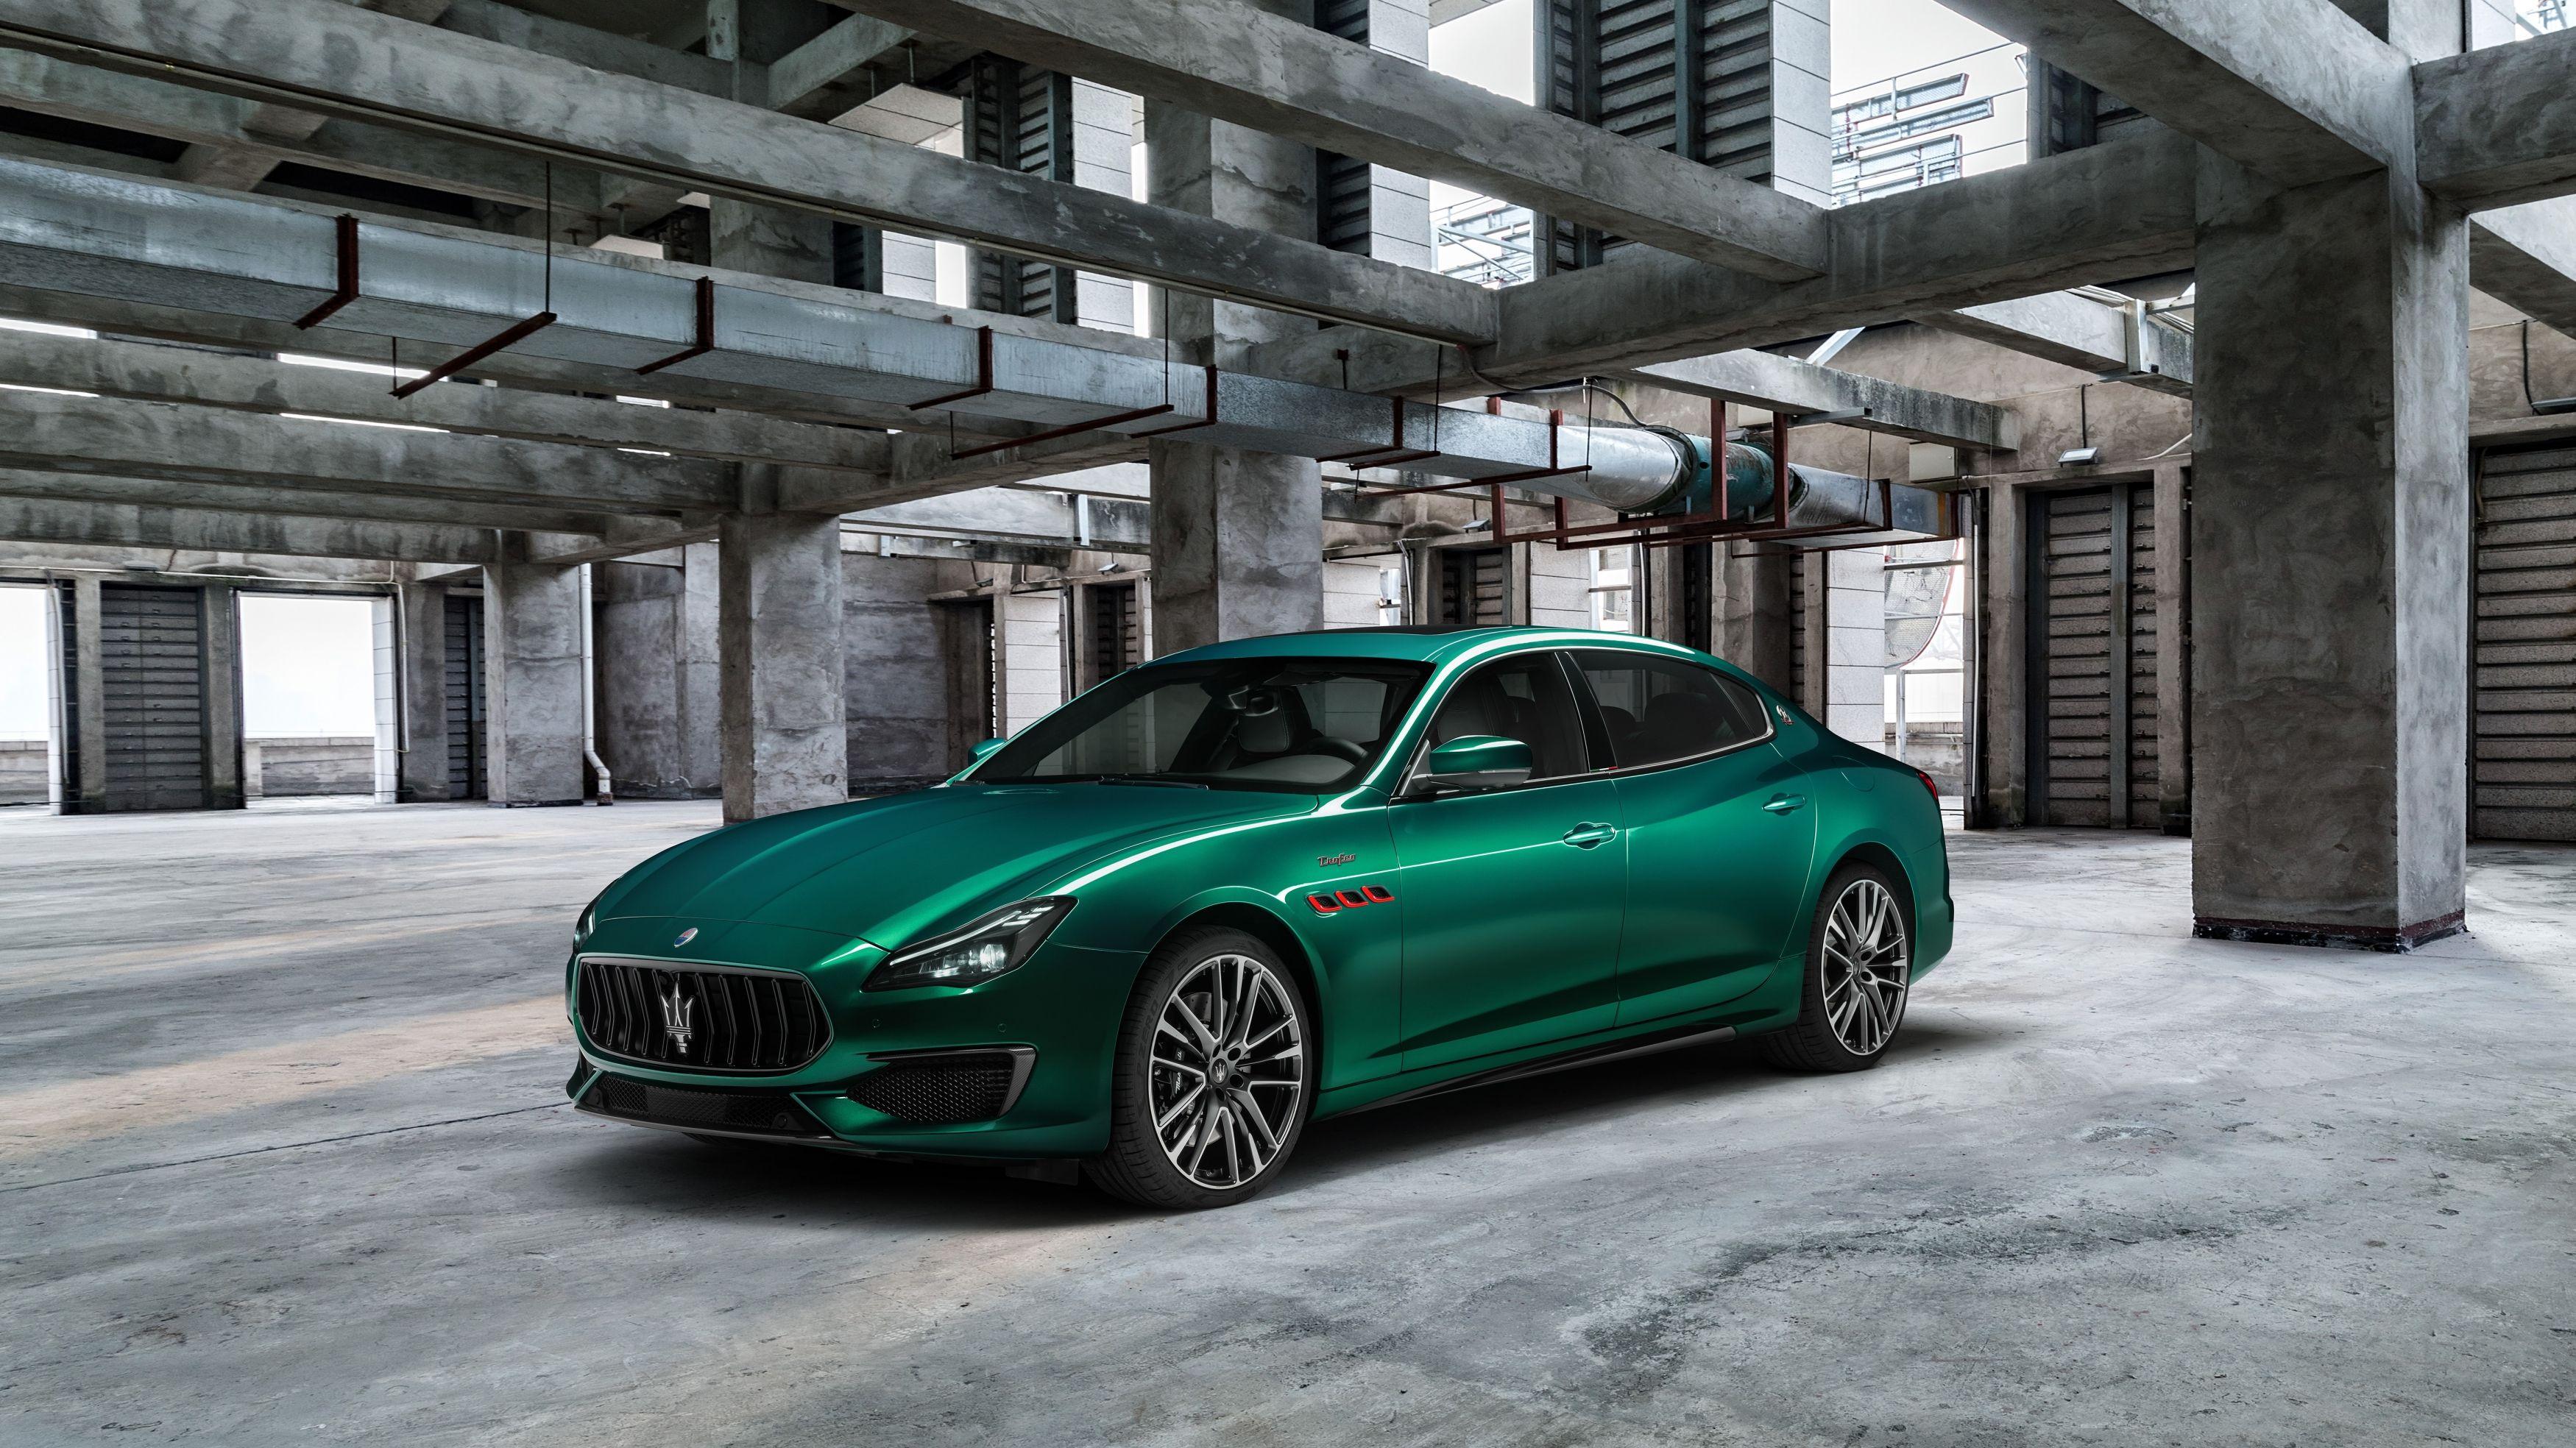 2021 Maserati Quattroporte Review Pricing And Specs